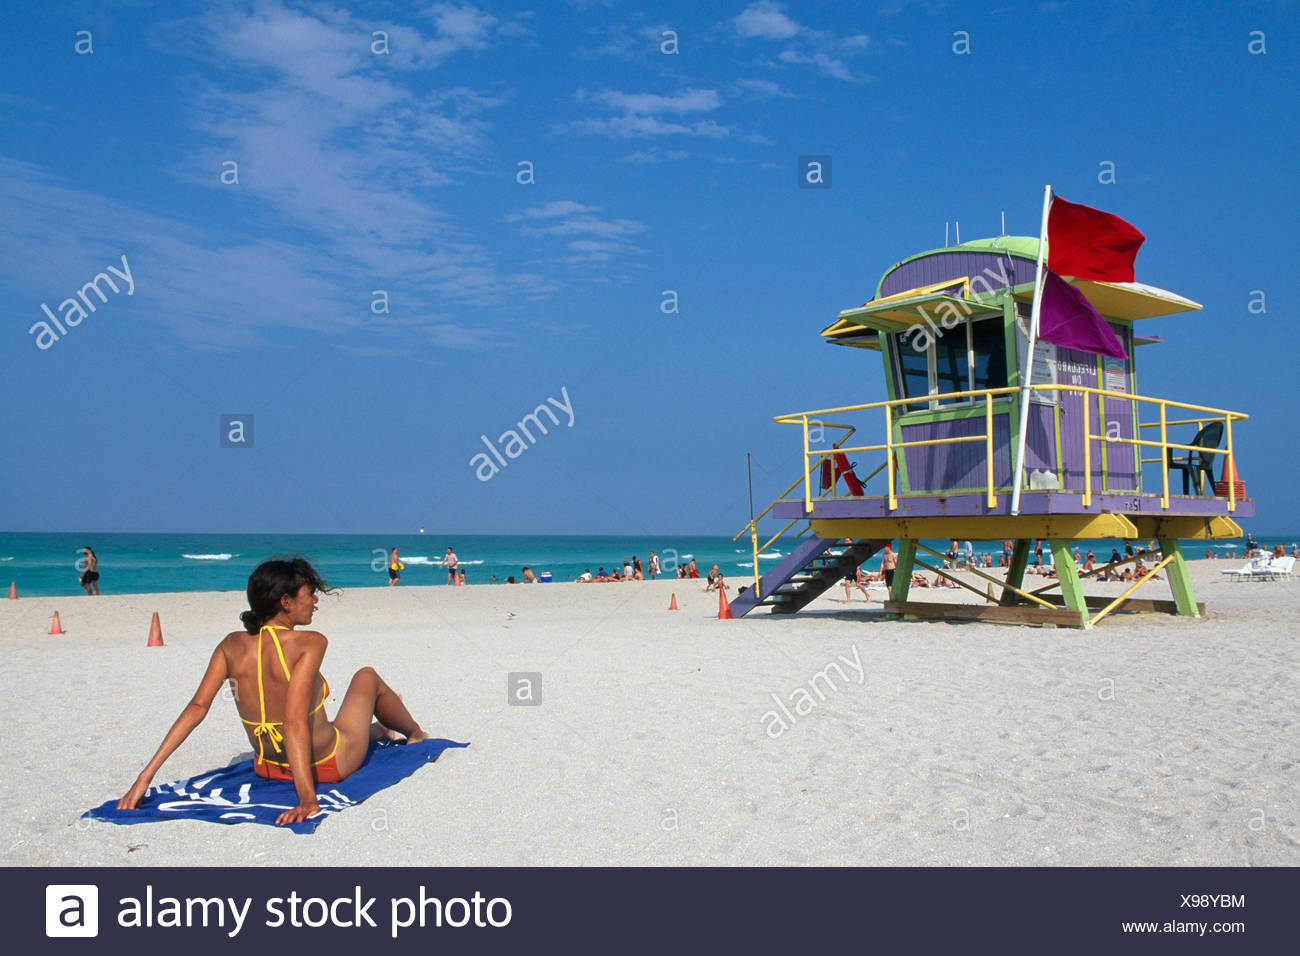 Woman and lifeguard tower at South Beach, Miami Beach, Miami, Florida, USA - Stock Image